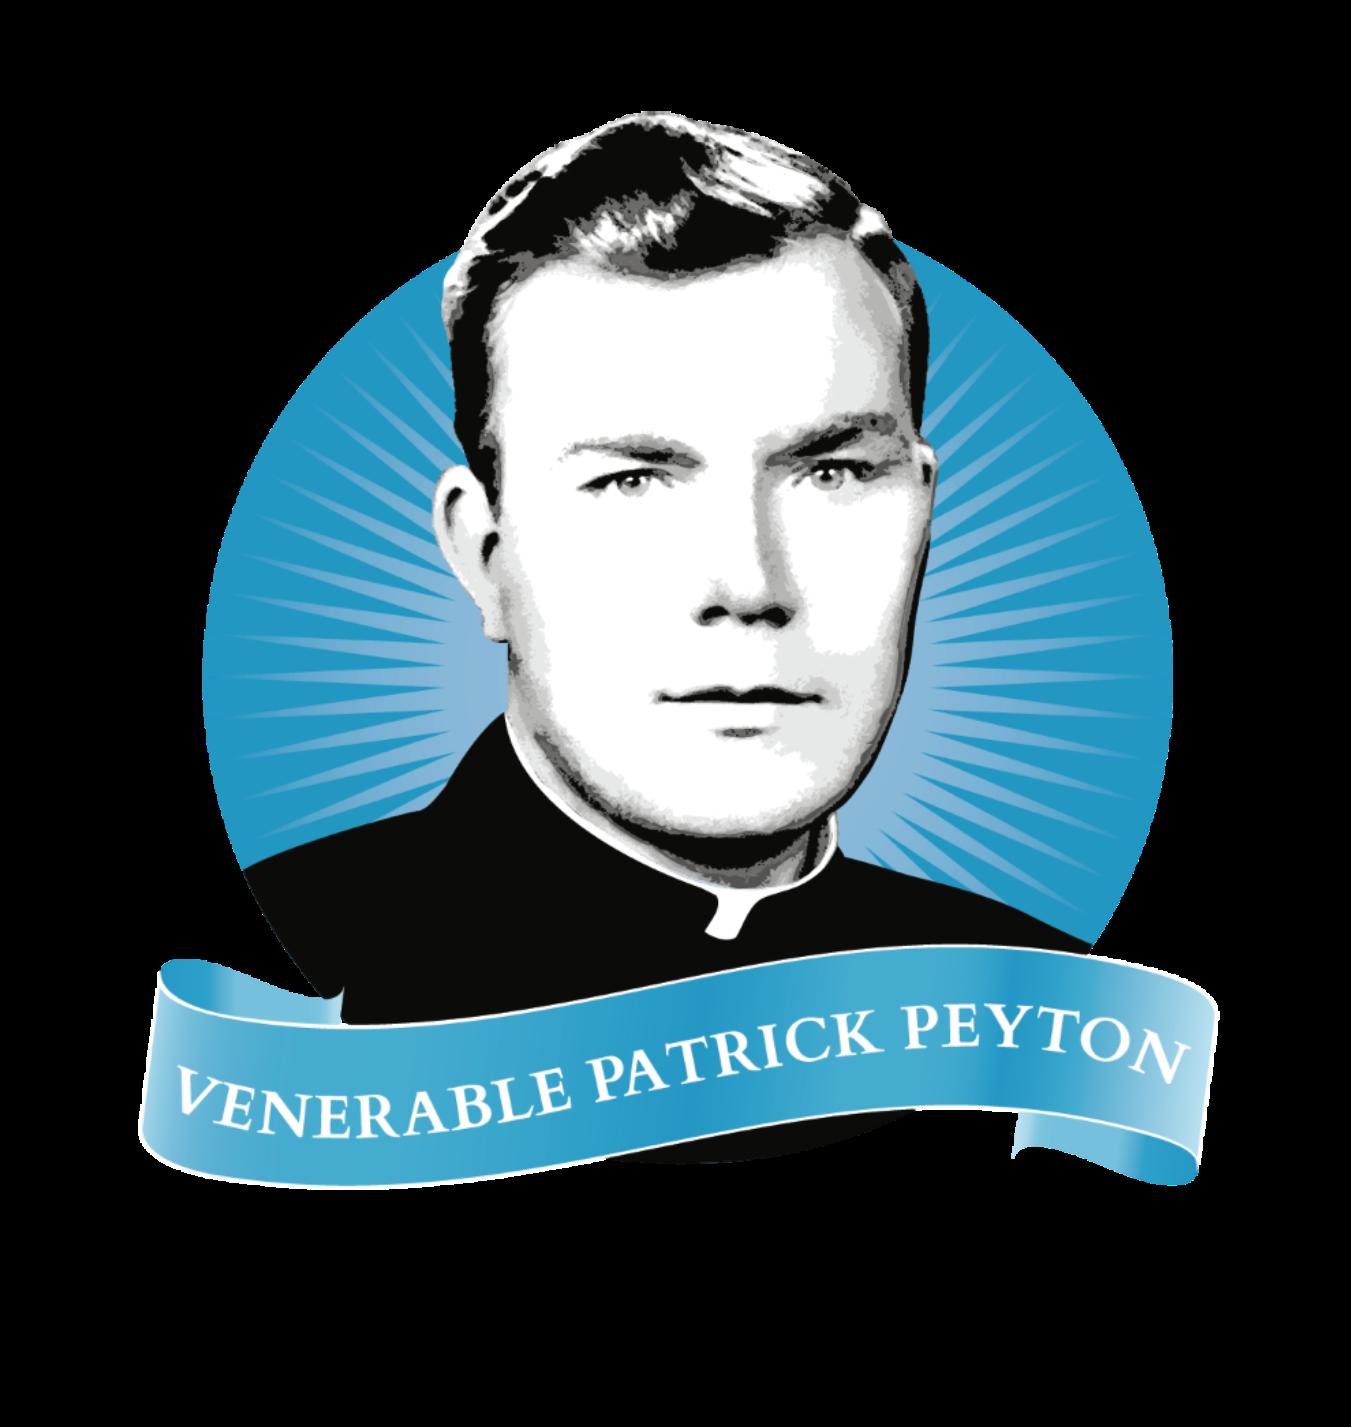 Father Peyton Prayer Guild logo cropped close